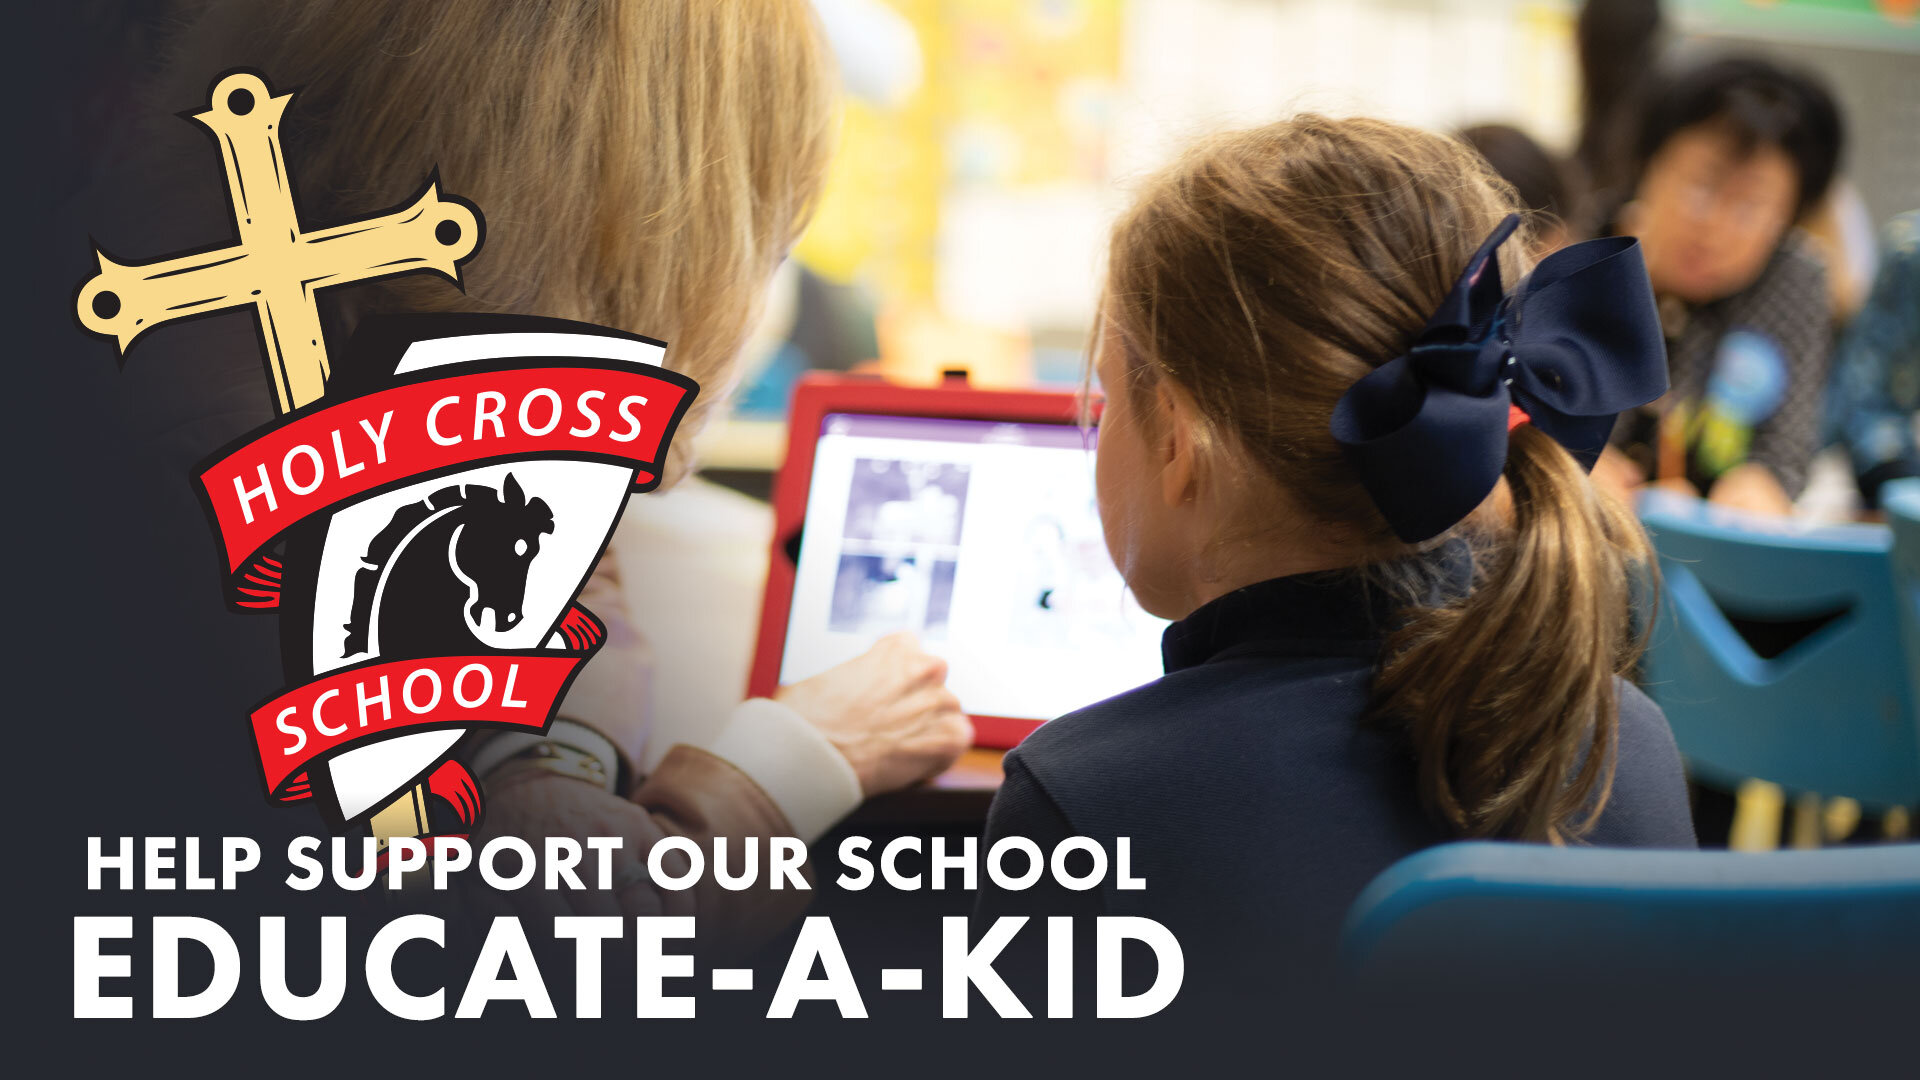 educate-a-kid-thumb.jpg